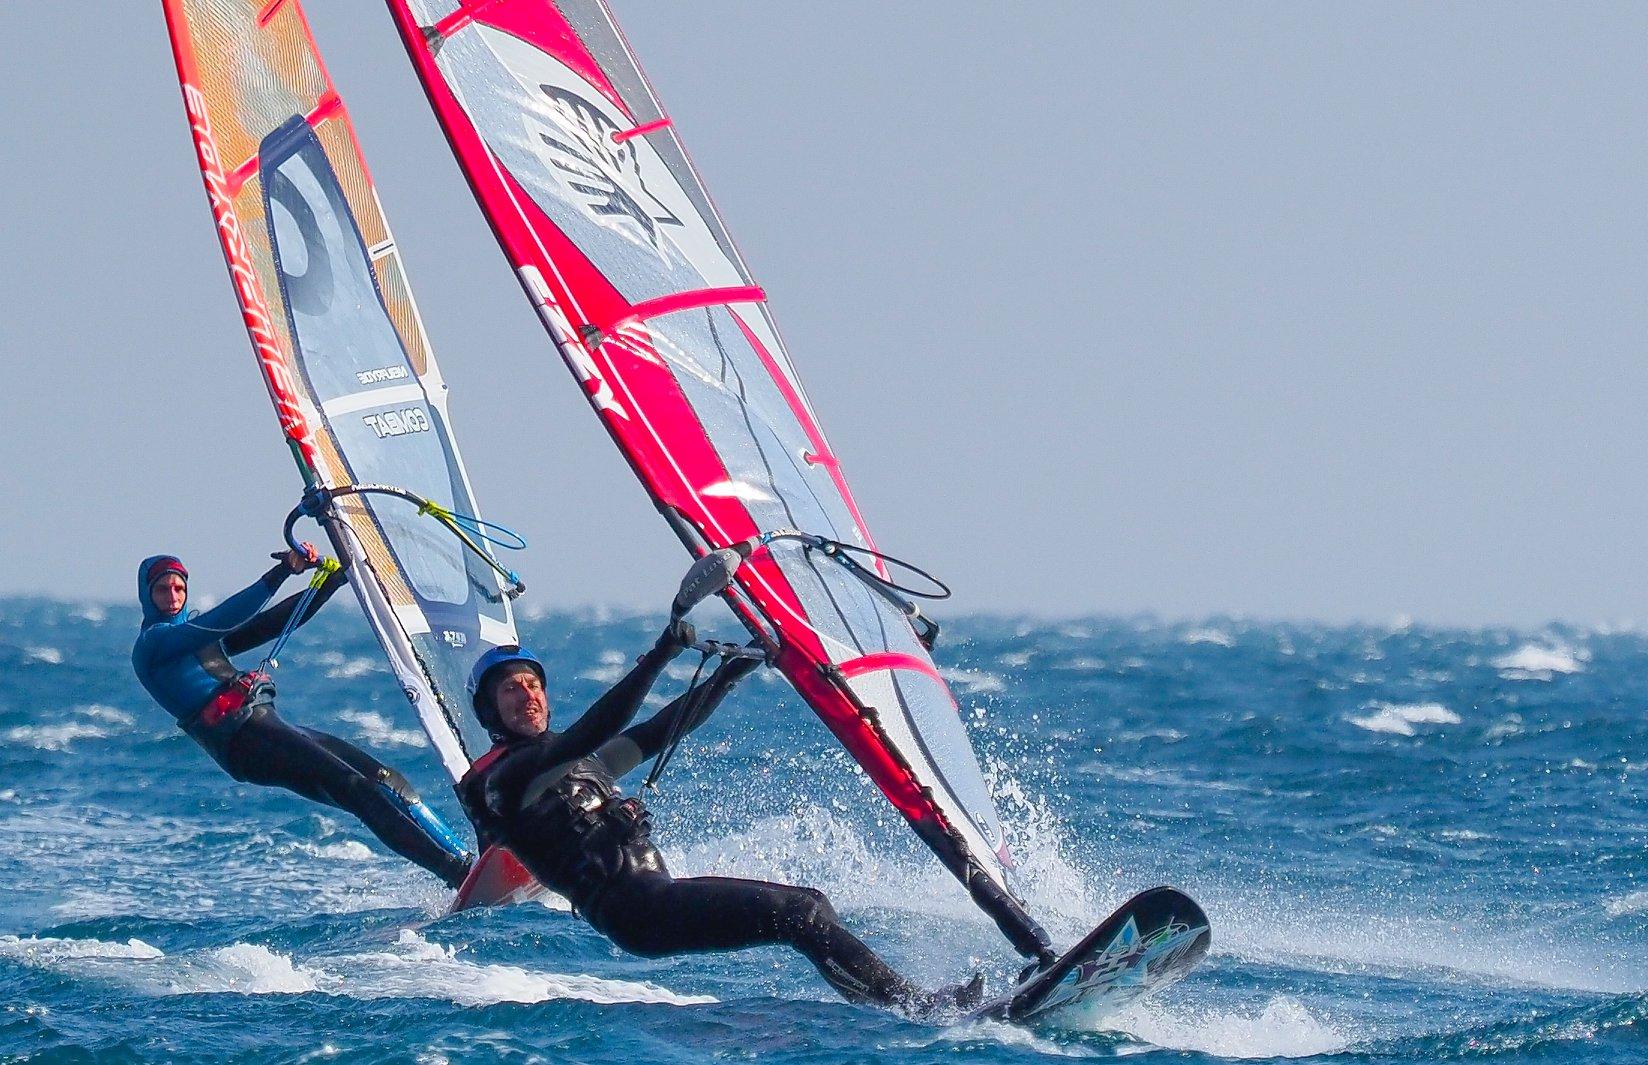 Windsurf_Noli_Marco_ed_IO.jpg